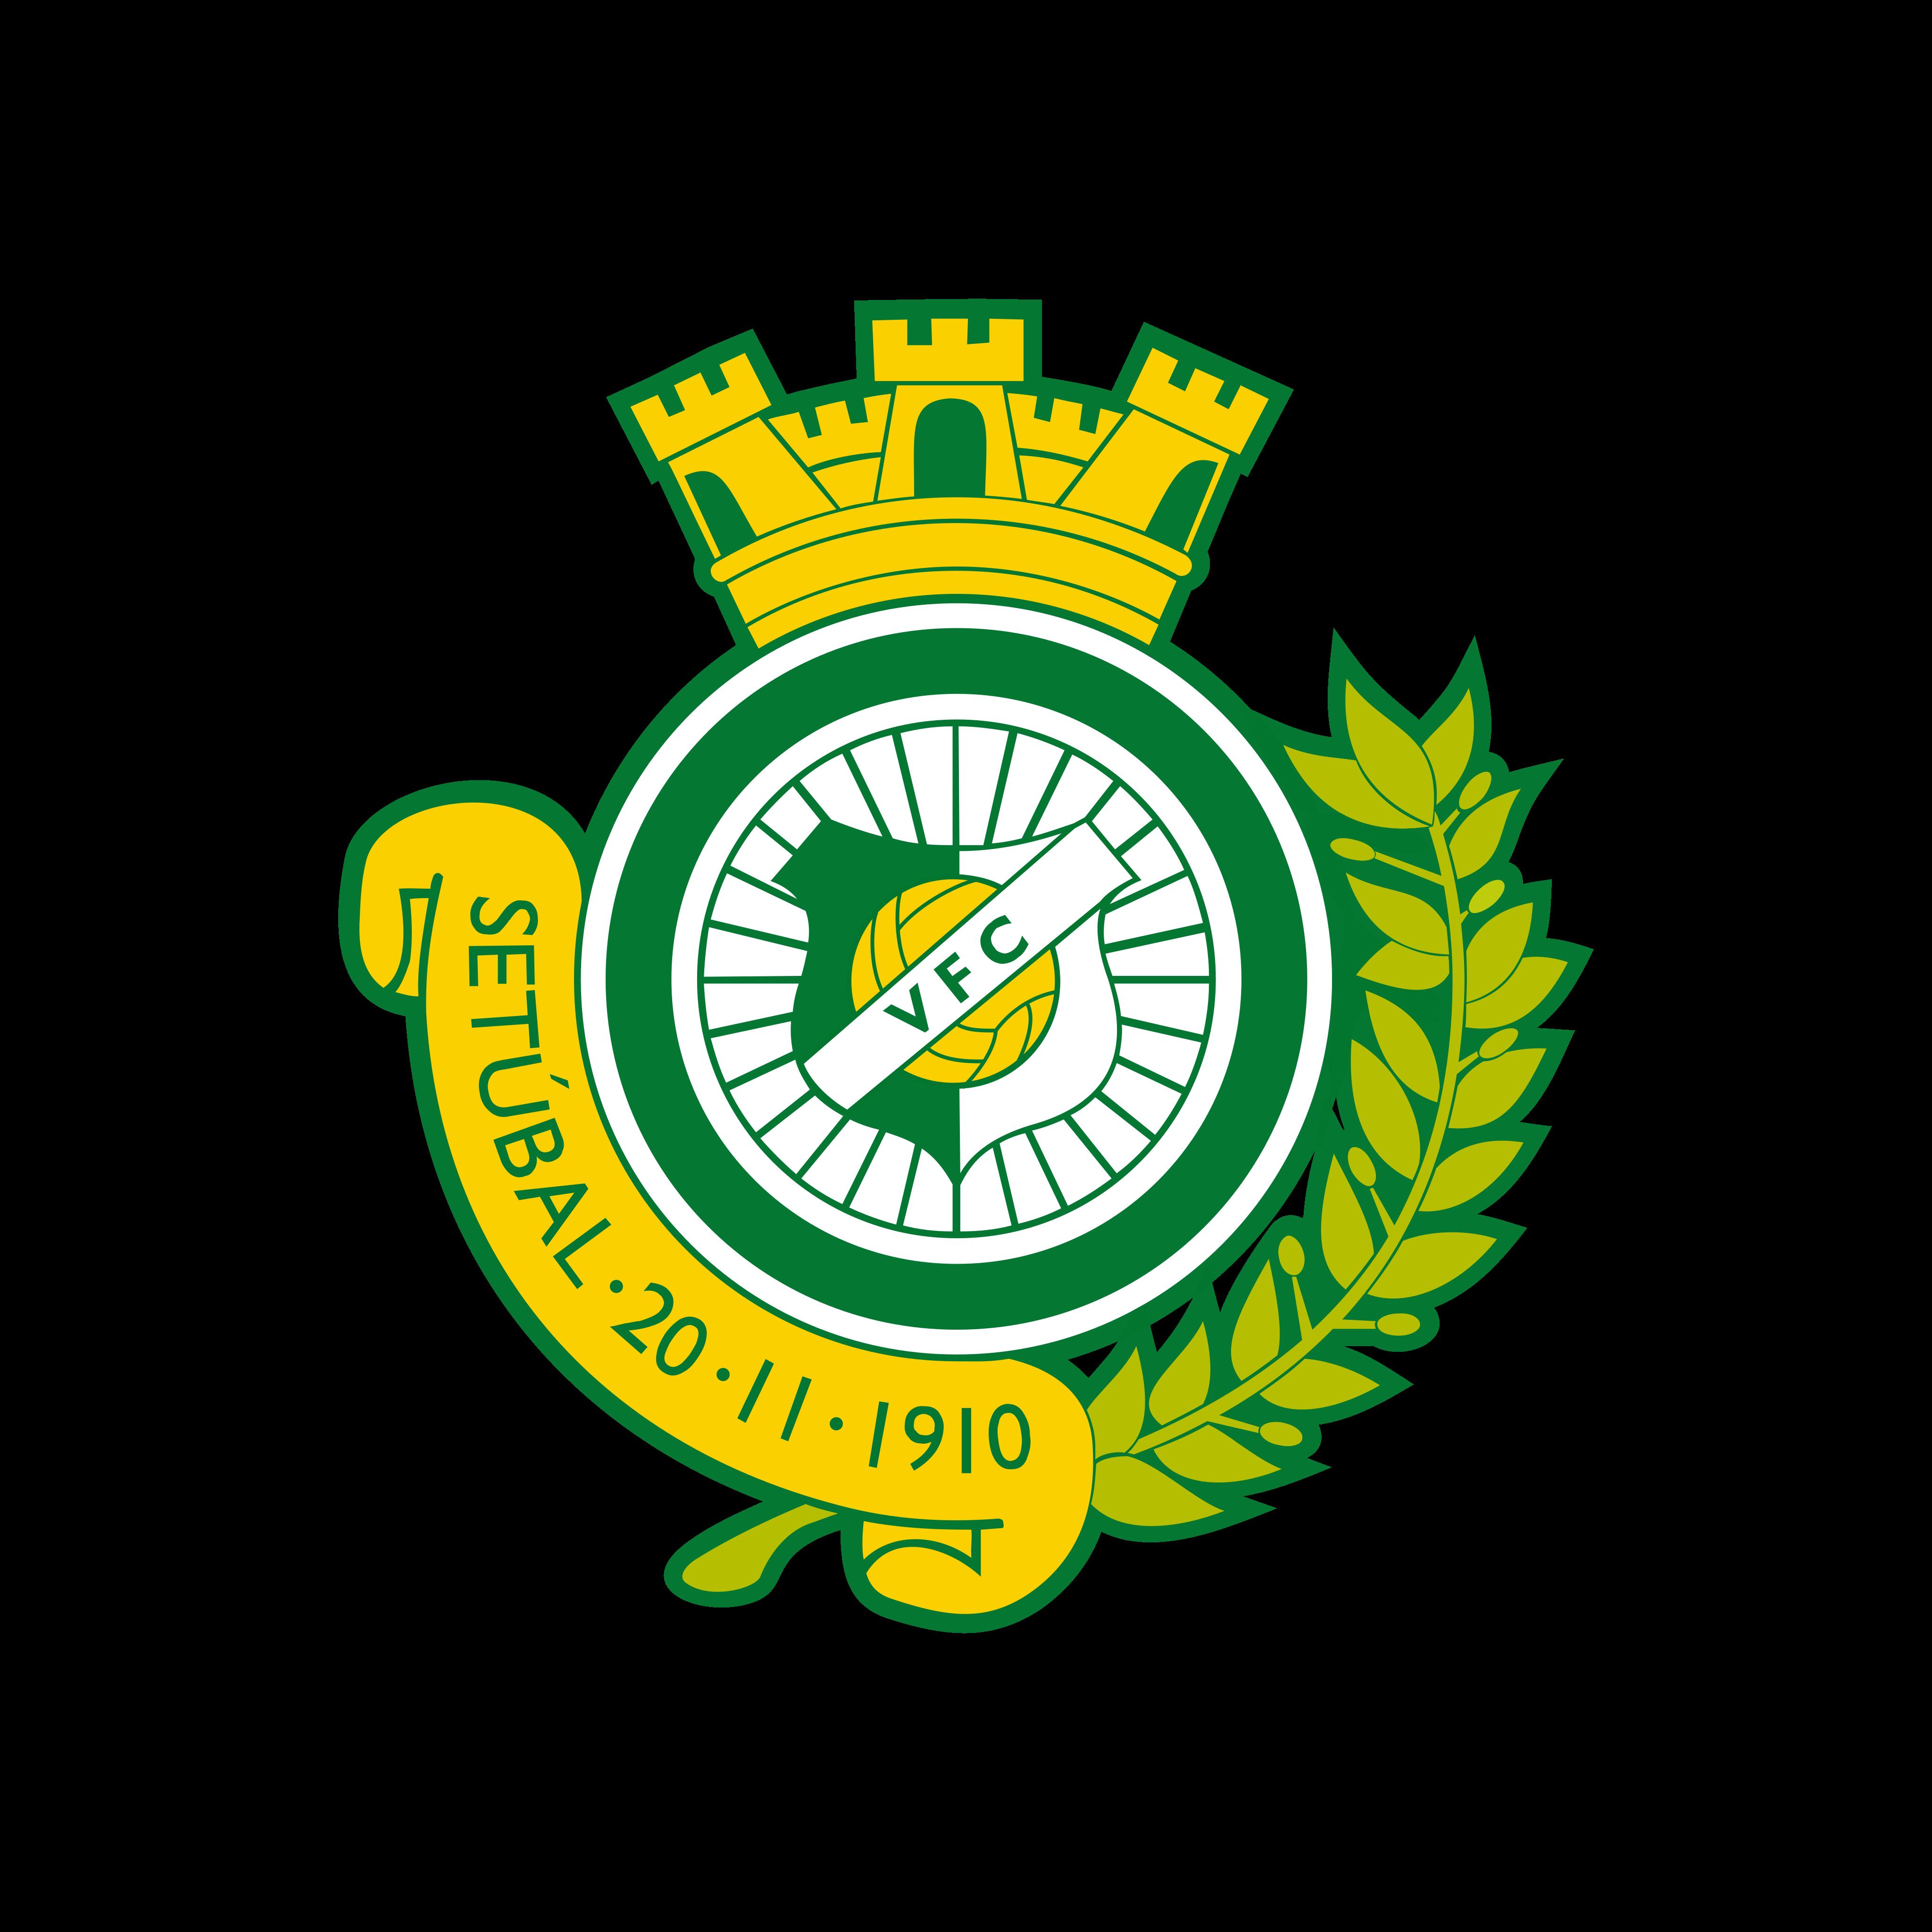 vitoria fc logo 0 - Vitória FC Logo